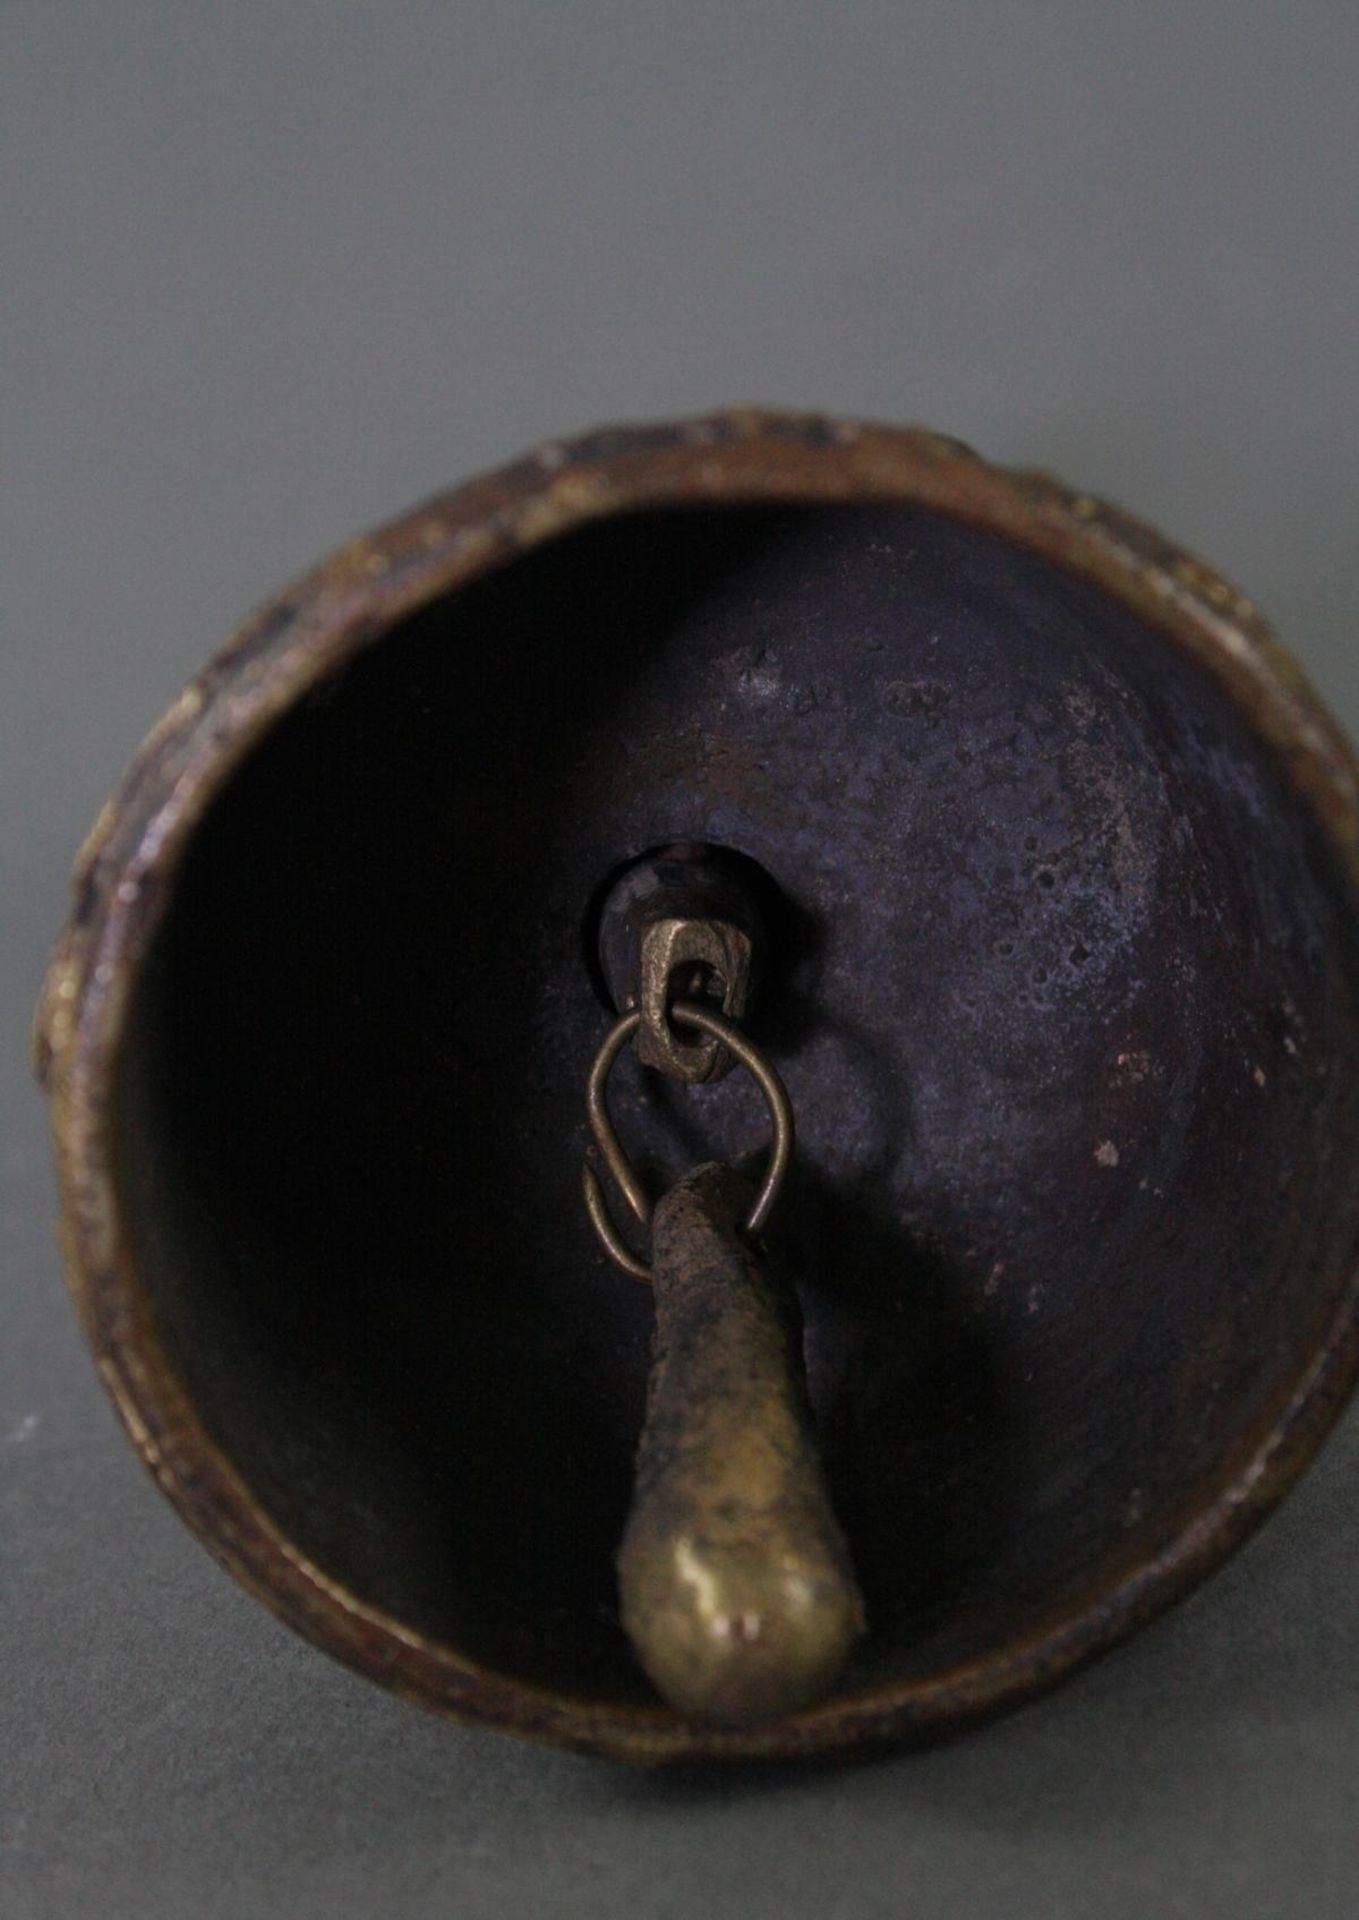 Hanuman-Glocke, Indien 19. Jahrhundert - Bild 5 aus 5